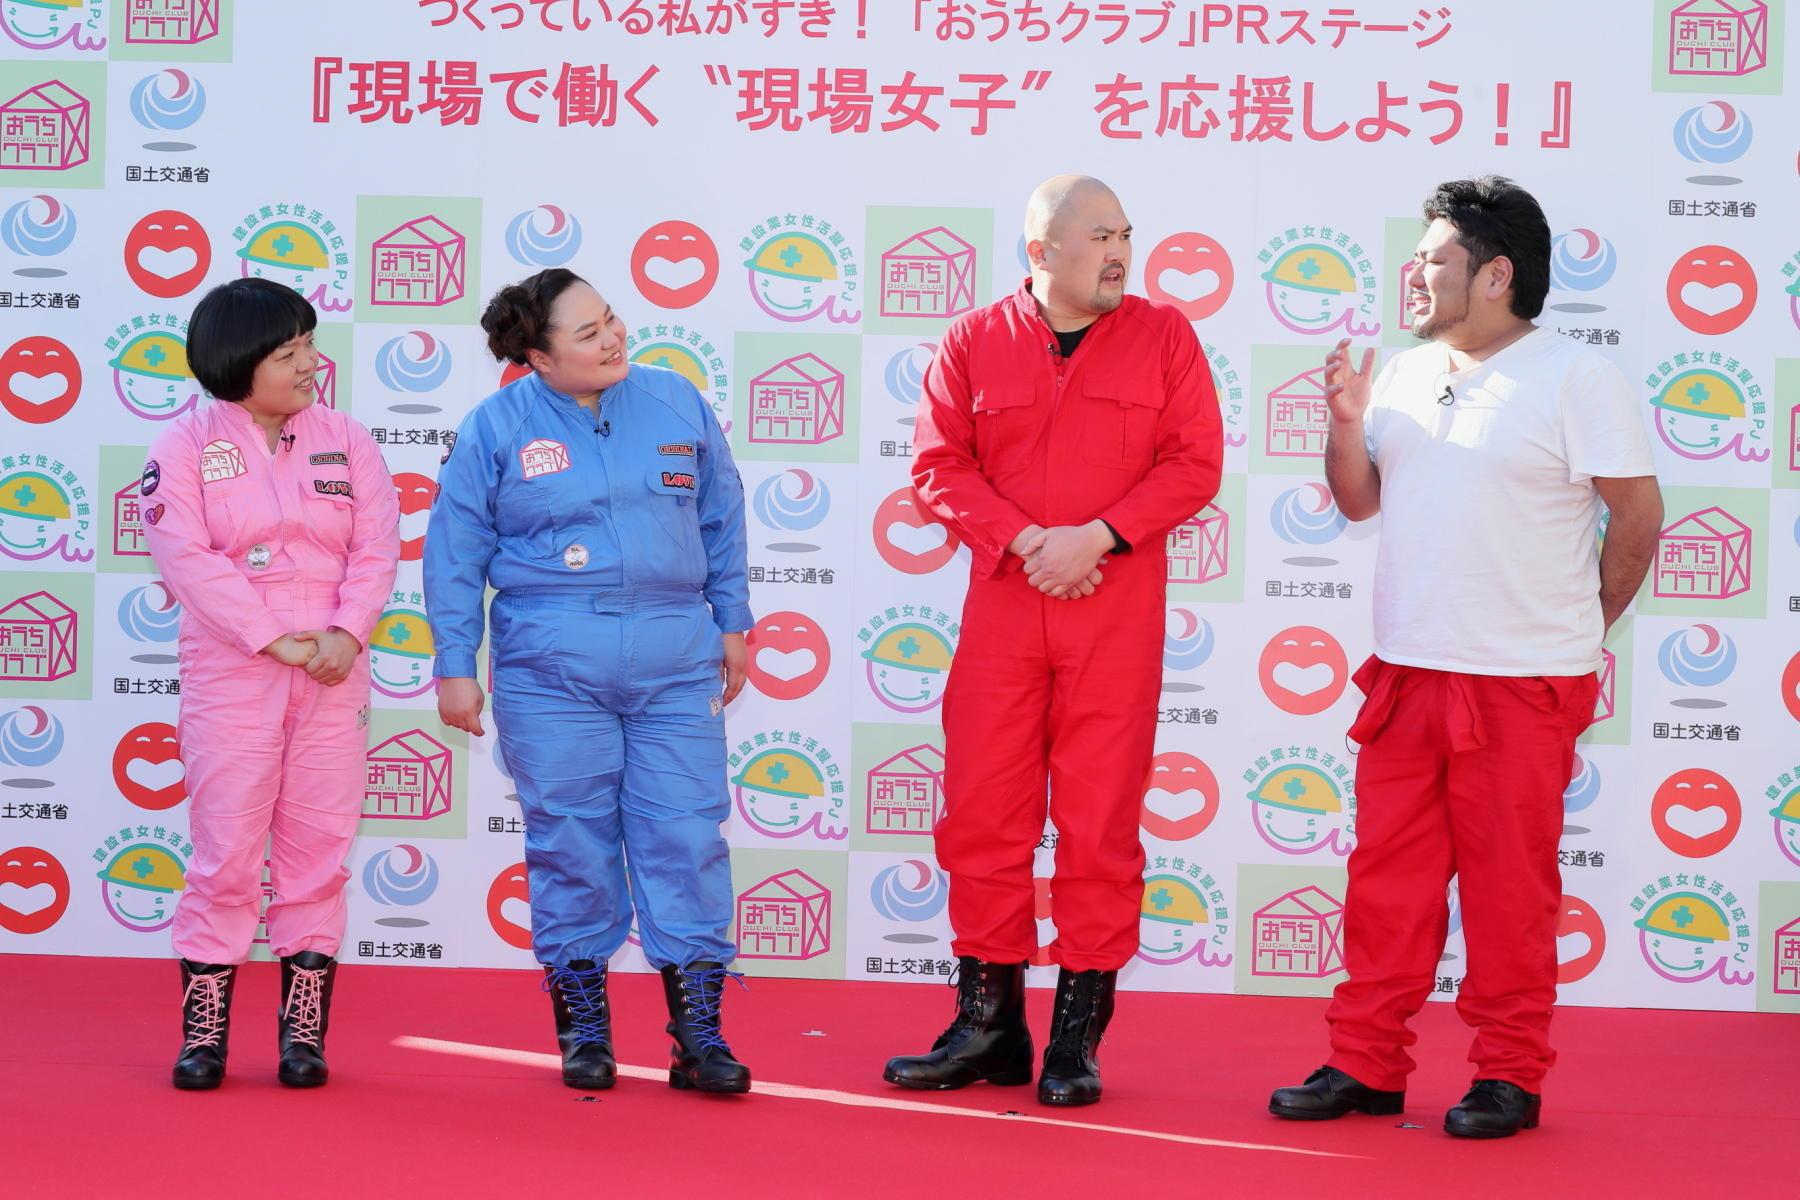 http://news.yoshimoto.co.jp/20170226095049-15069a0473e219a7cdfd8bc3aebd3a1628dbb60f.jpg